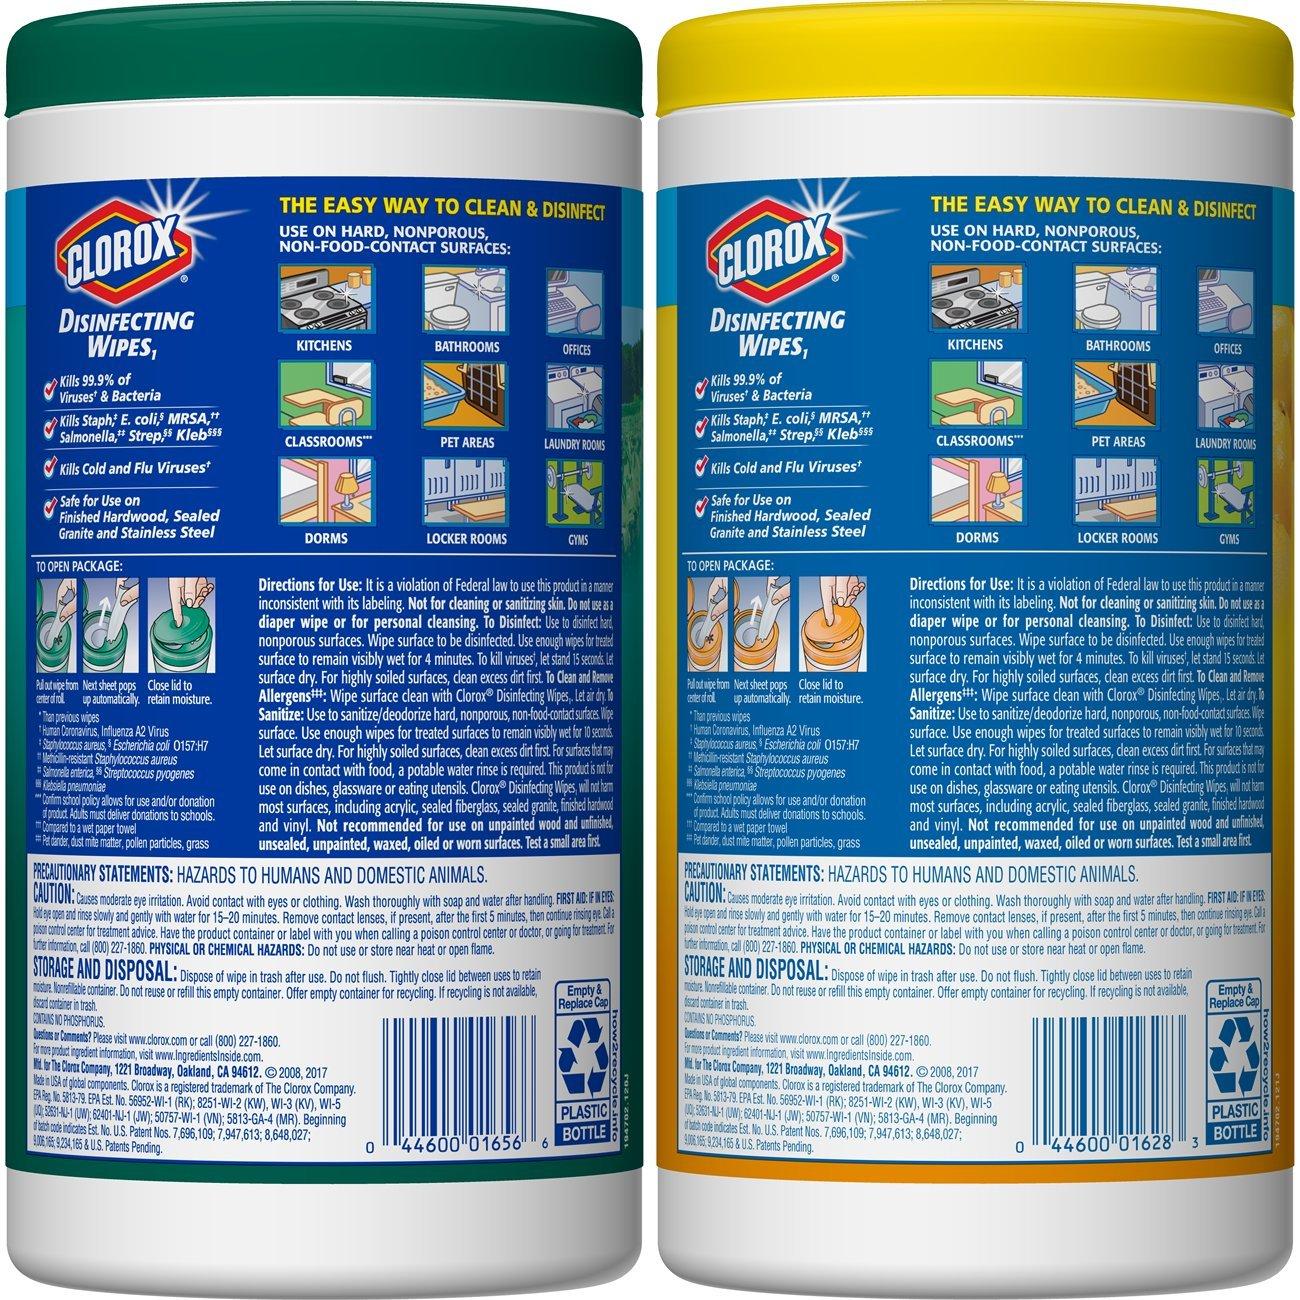 Amazon.com: Clorox Disinfecting Antibacterial Wipes Value Pack ...